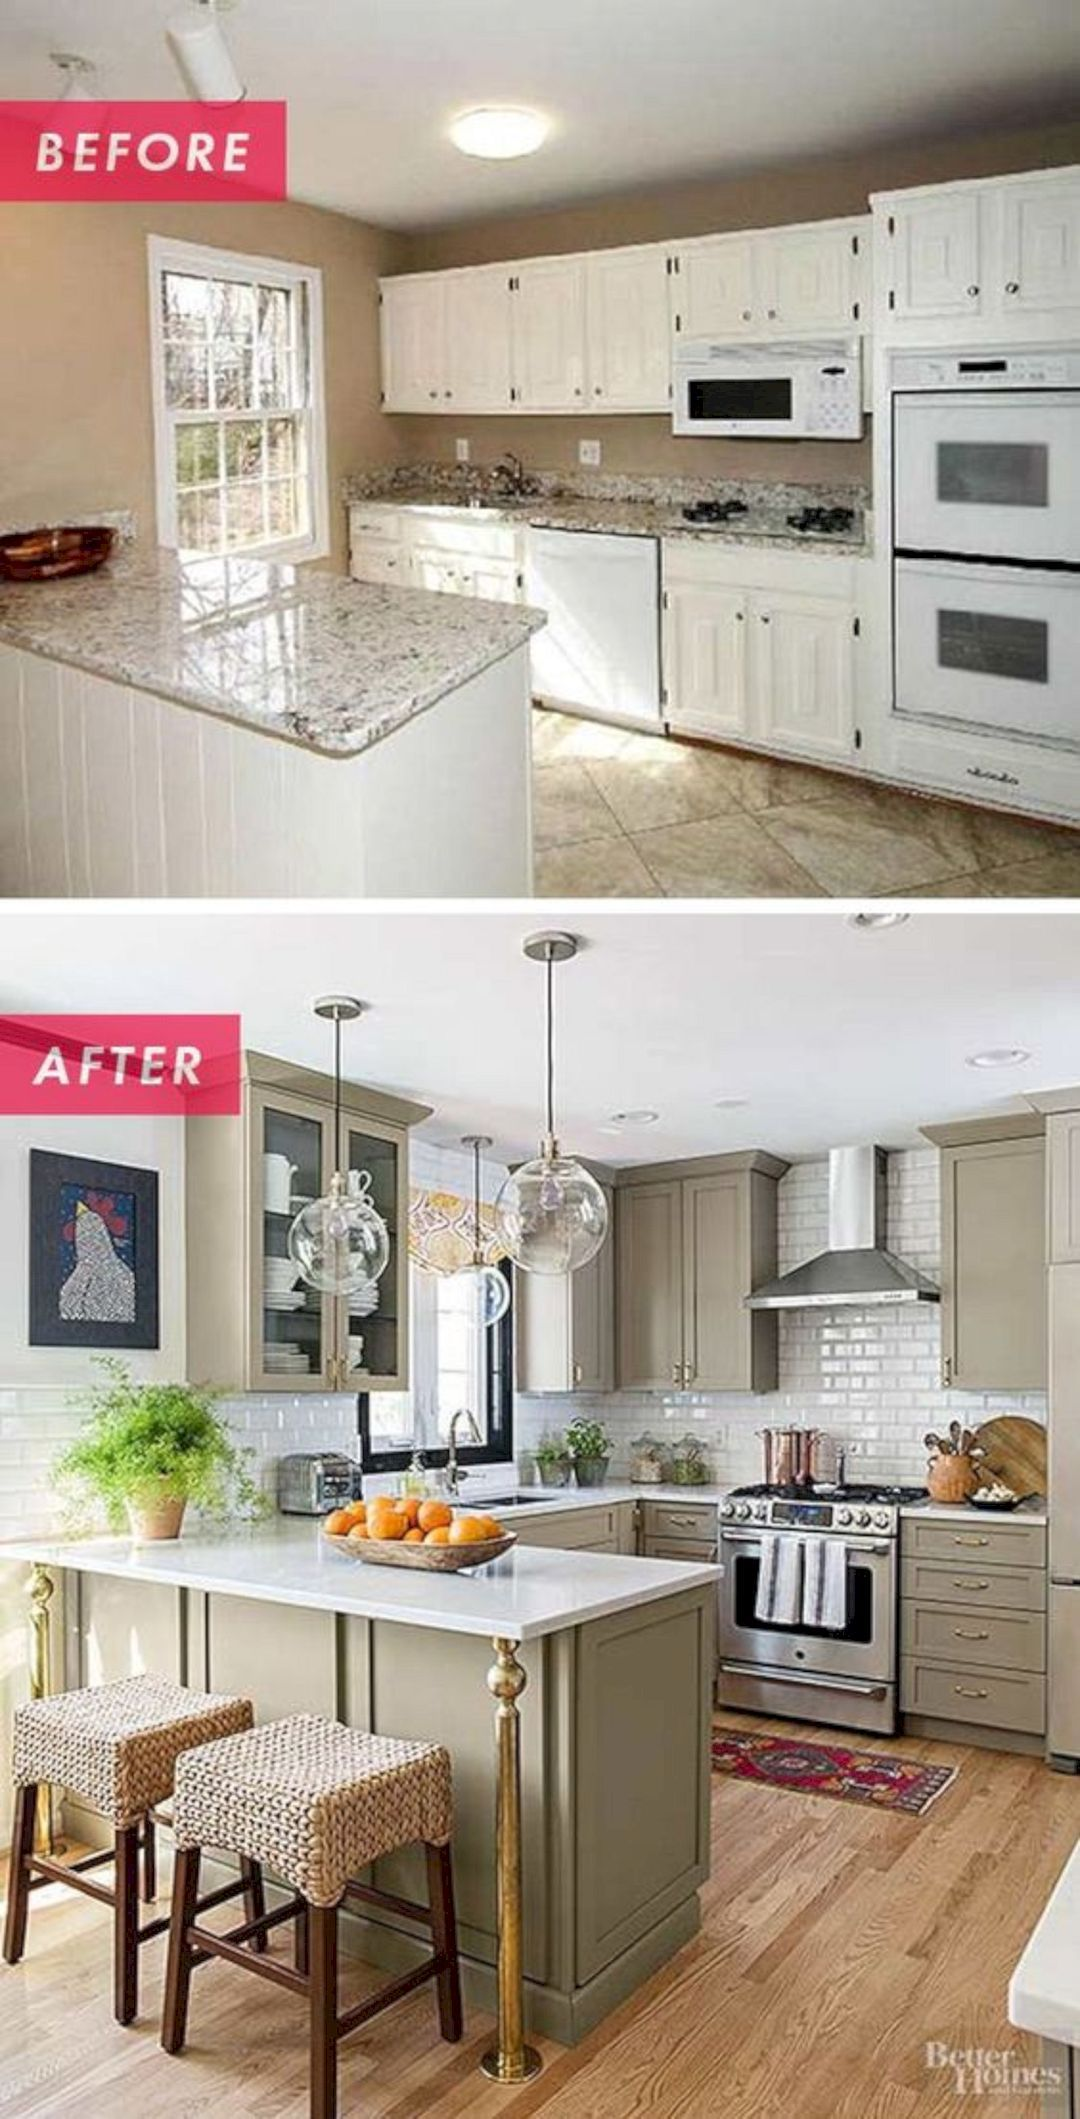 18 gorgeous interior design renovation ideas small kitchen renovations kitchen cabinet on kitchen remodel ideas id=75200